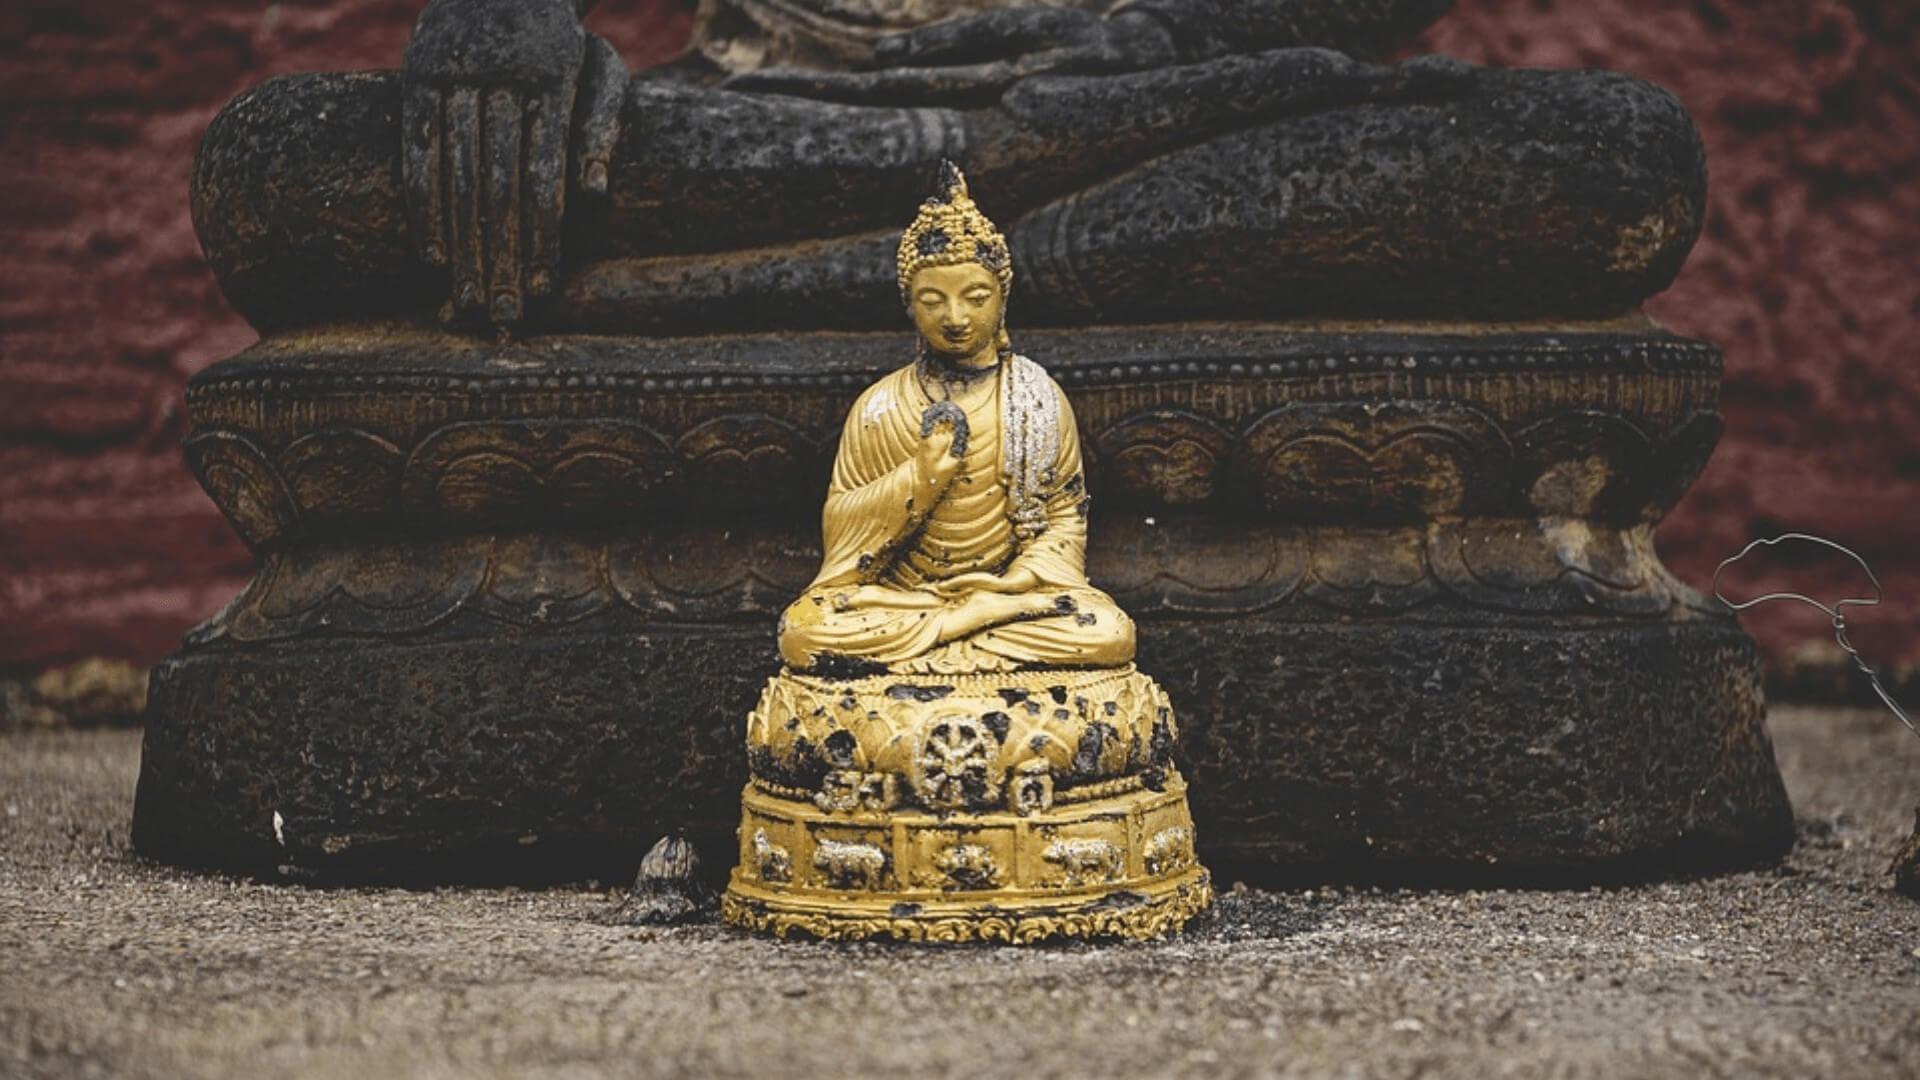 3 Steps To Heal PTSD With Meditation | PTSD Meditation Guide And Walkthrough